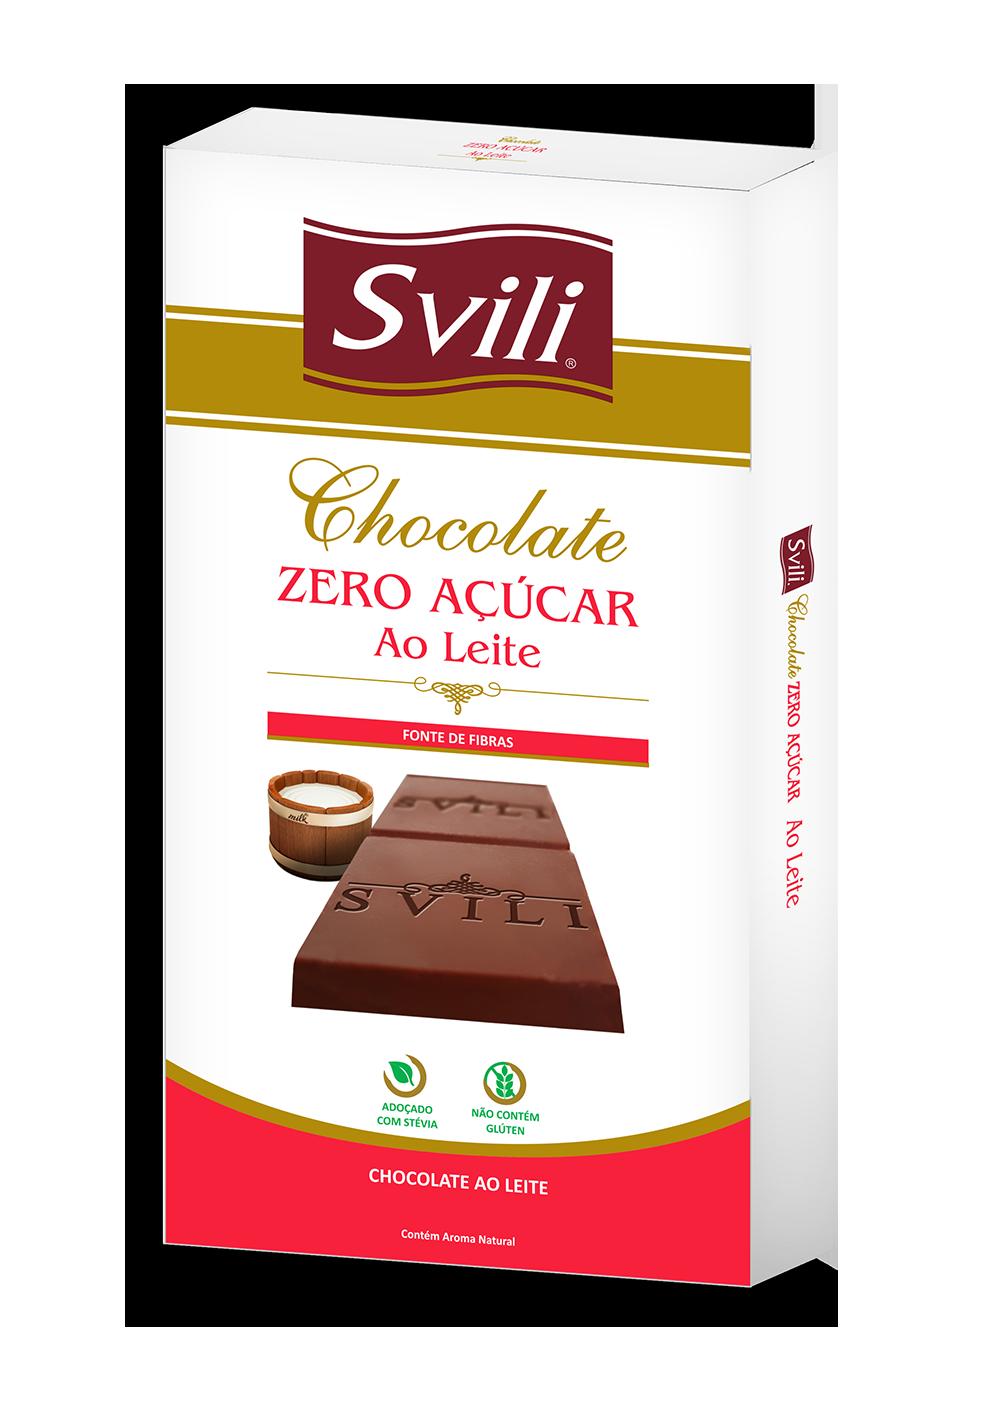 BARRA DE CHOCOLATE AO LEITE ZERO AÇÚCAR